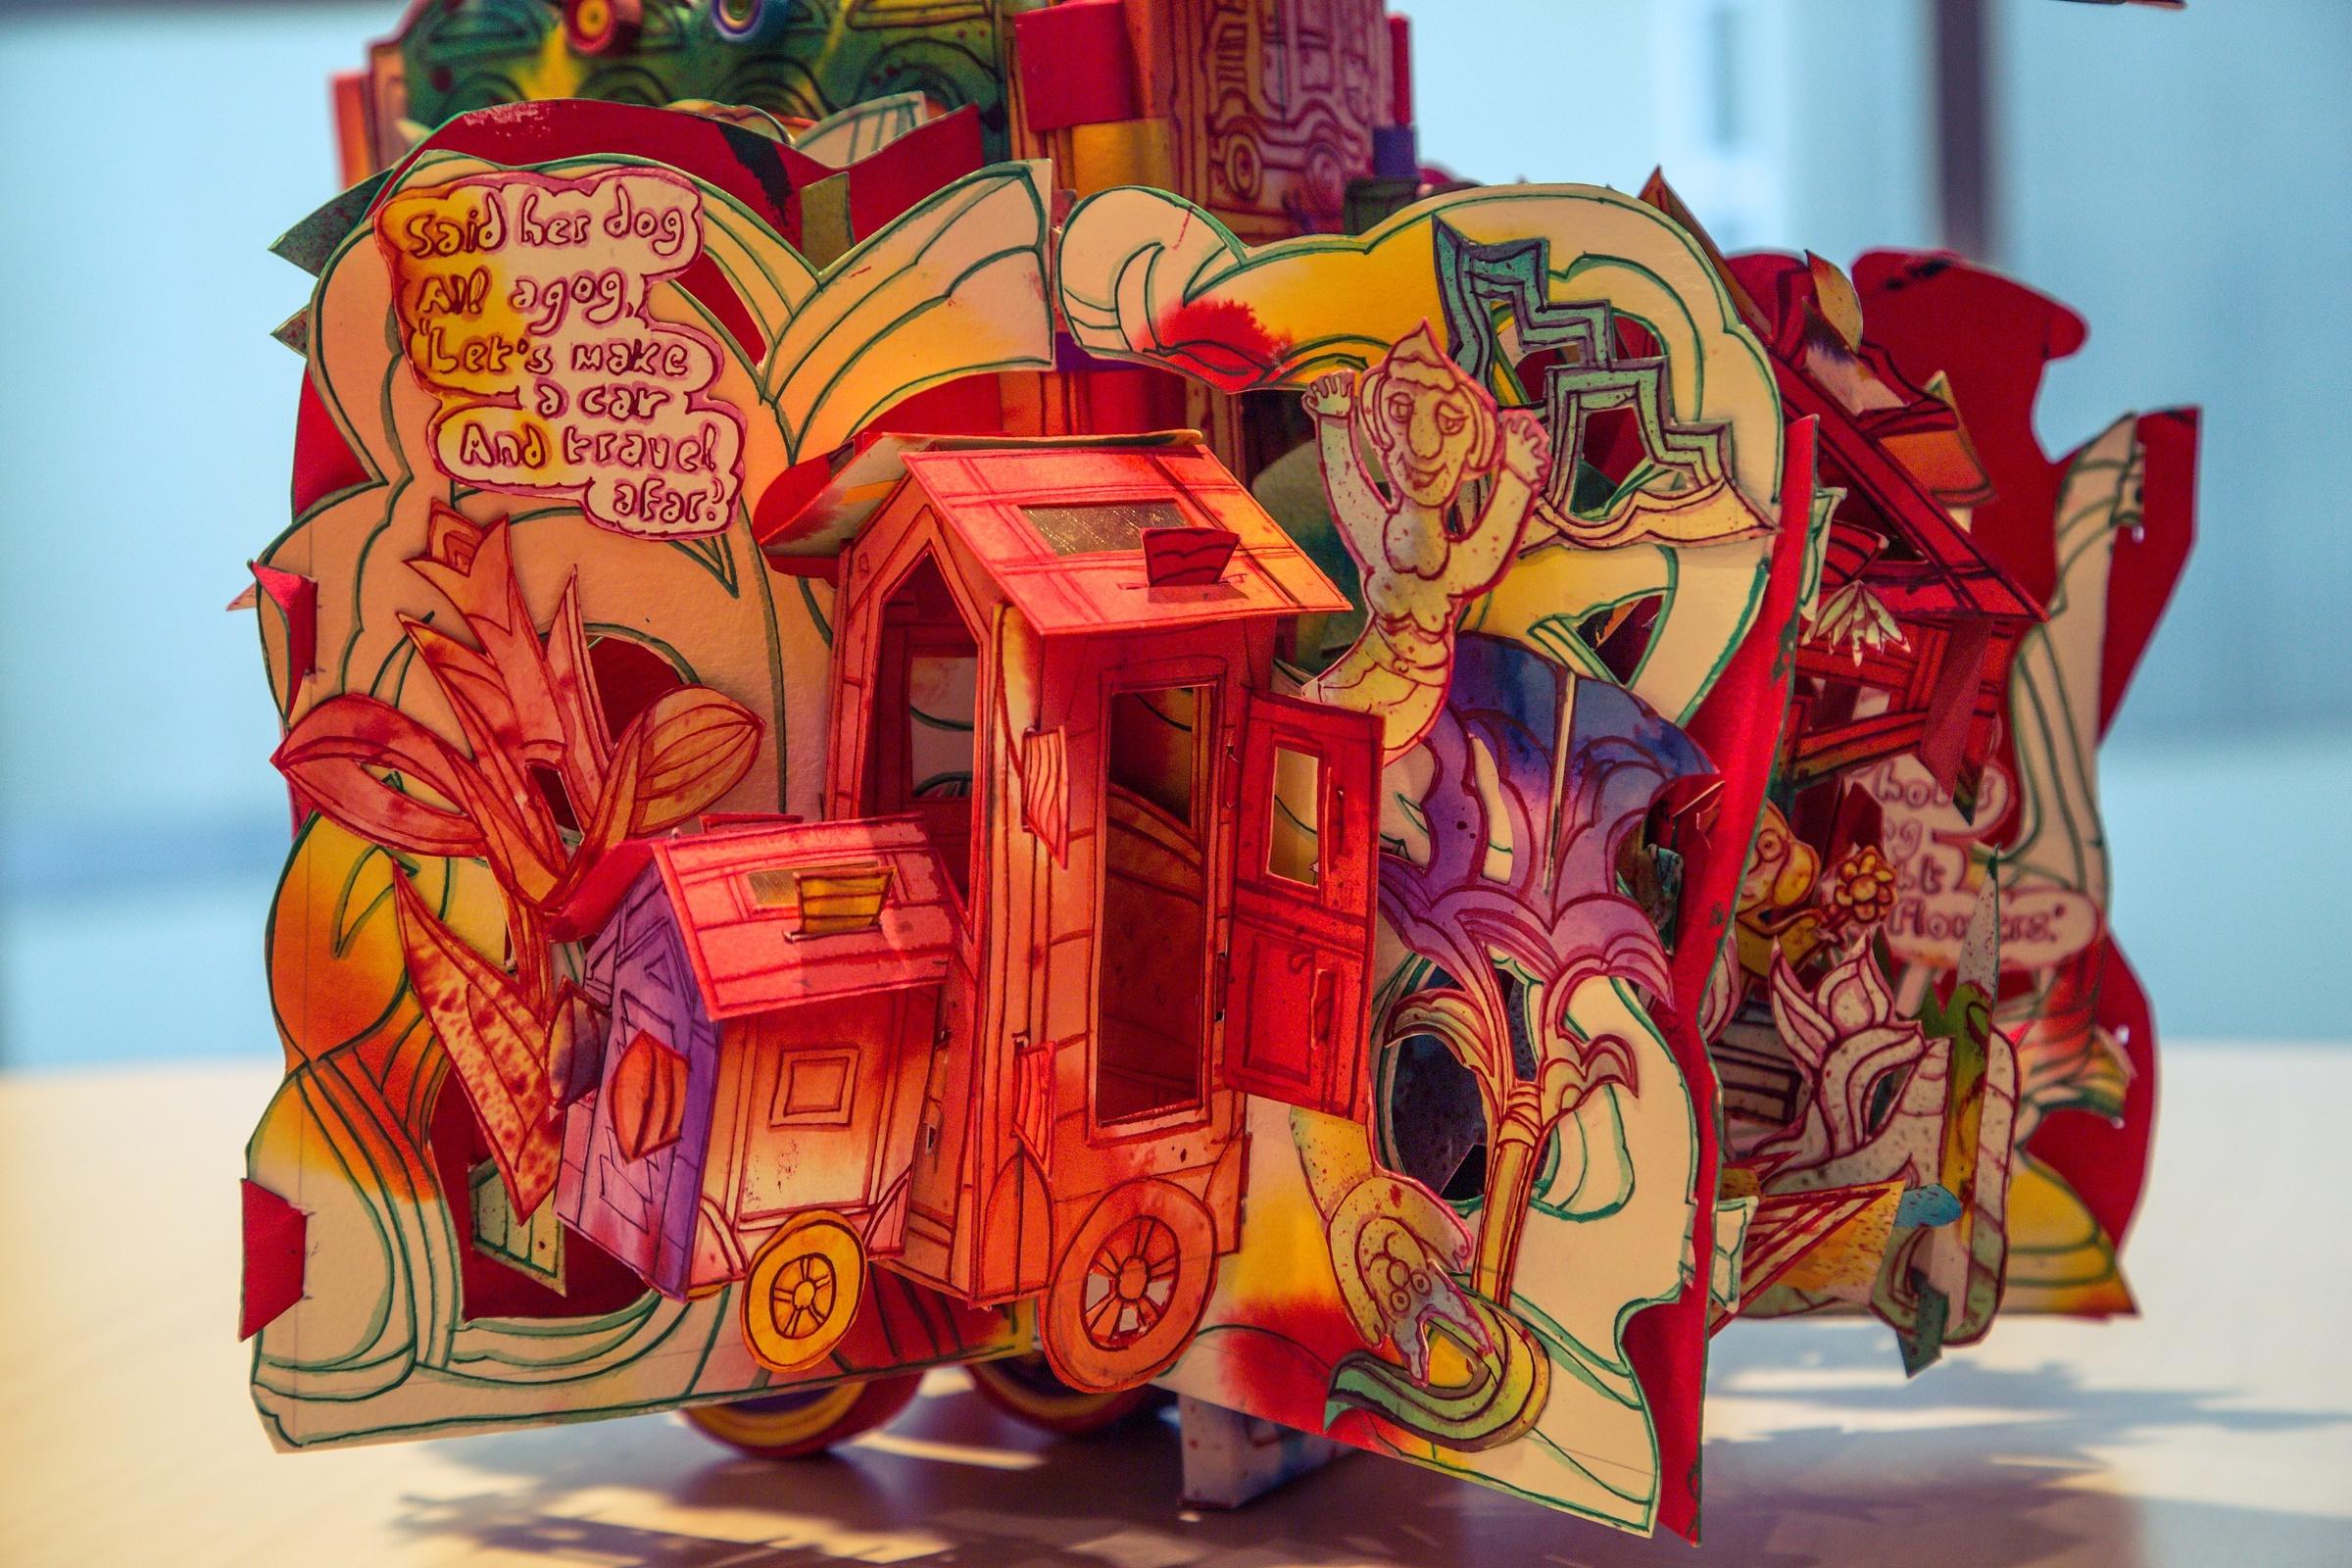 Unfolding the Story Behind Paul Johnson's No-Fold Pop-Up Books